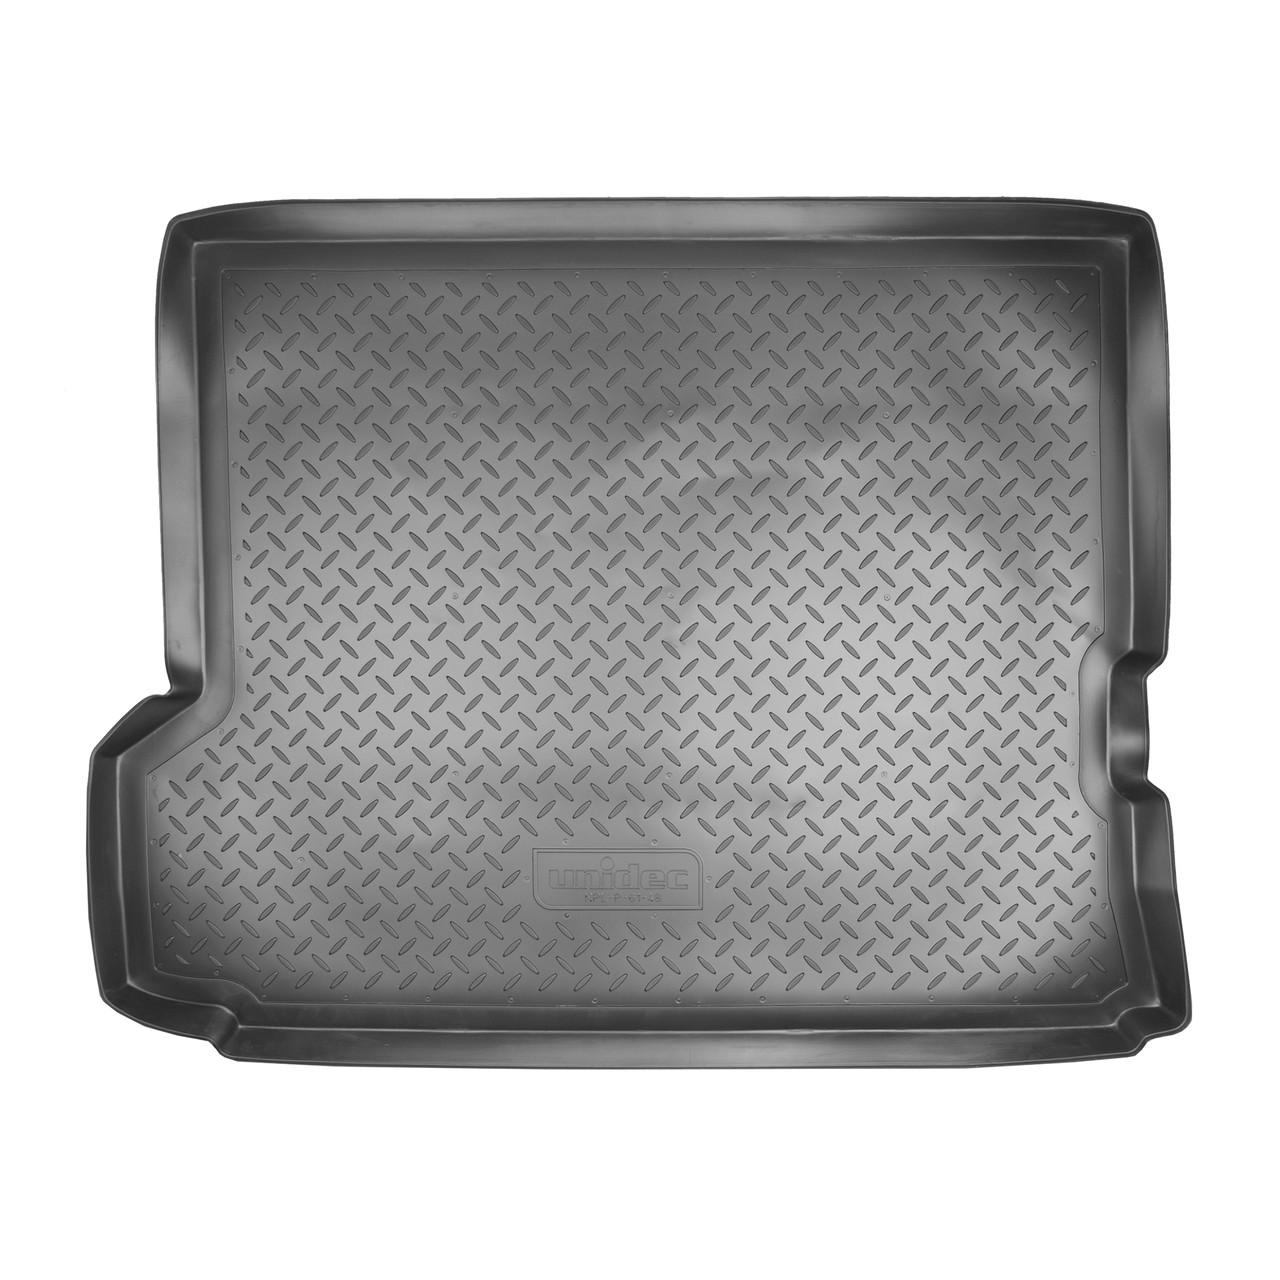 Коврик в багажник Nissan Patrol (2004-2010)